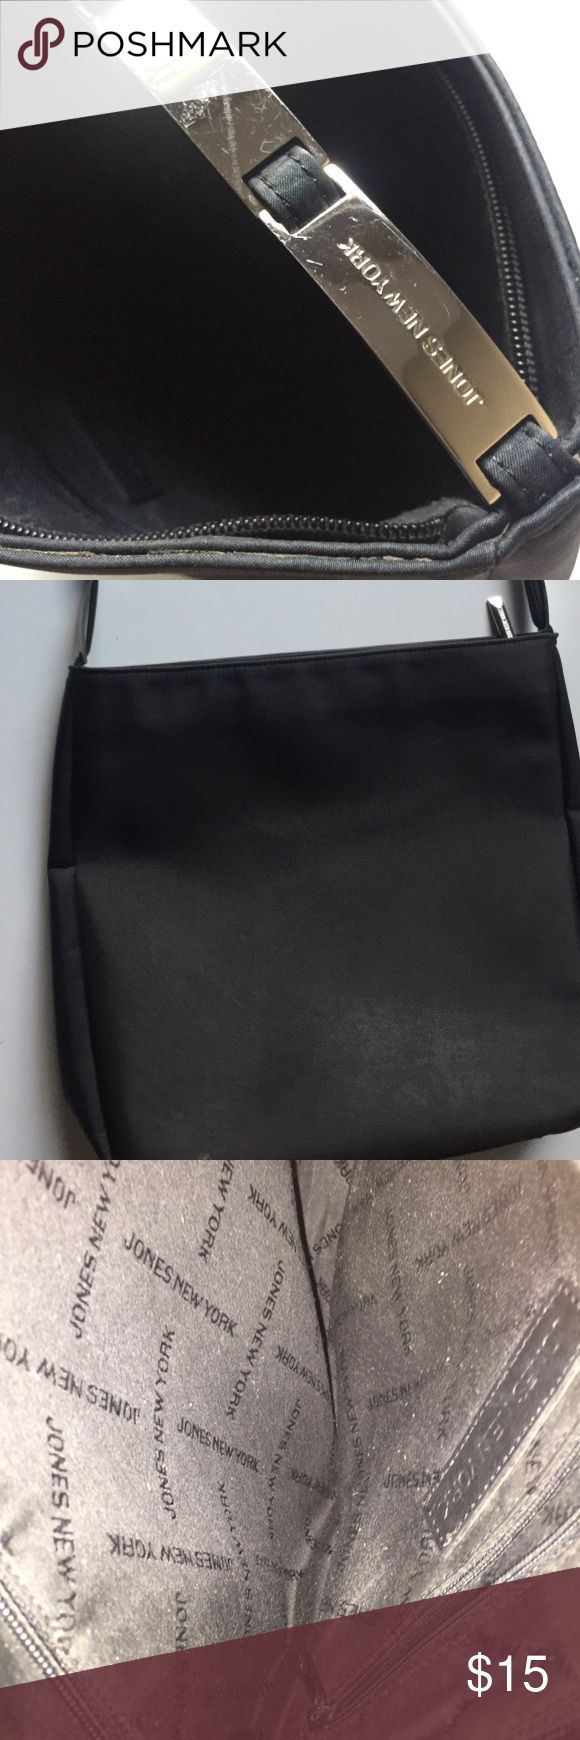 Jones New York Purse Excellent condition. Like new. Black Jones New York purse with silver shoulder strap. Jones New York Bags Shoulder Bags